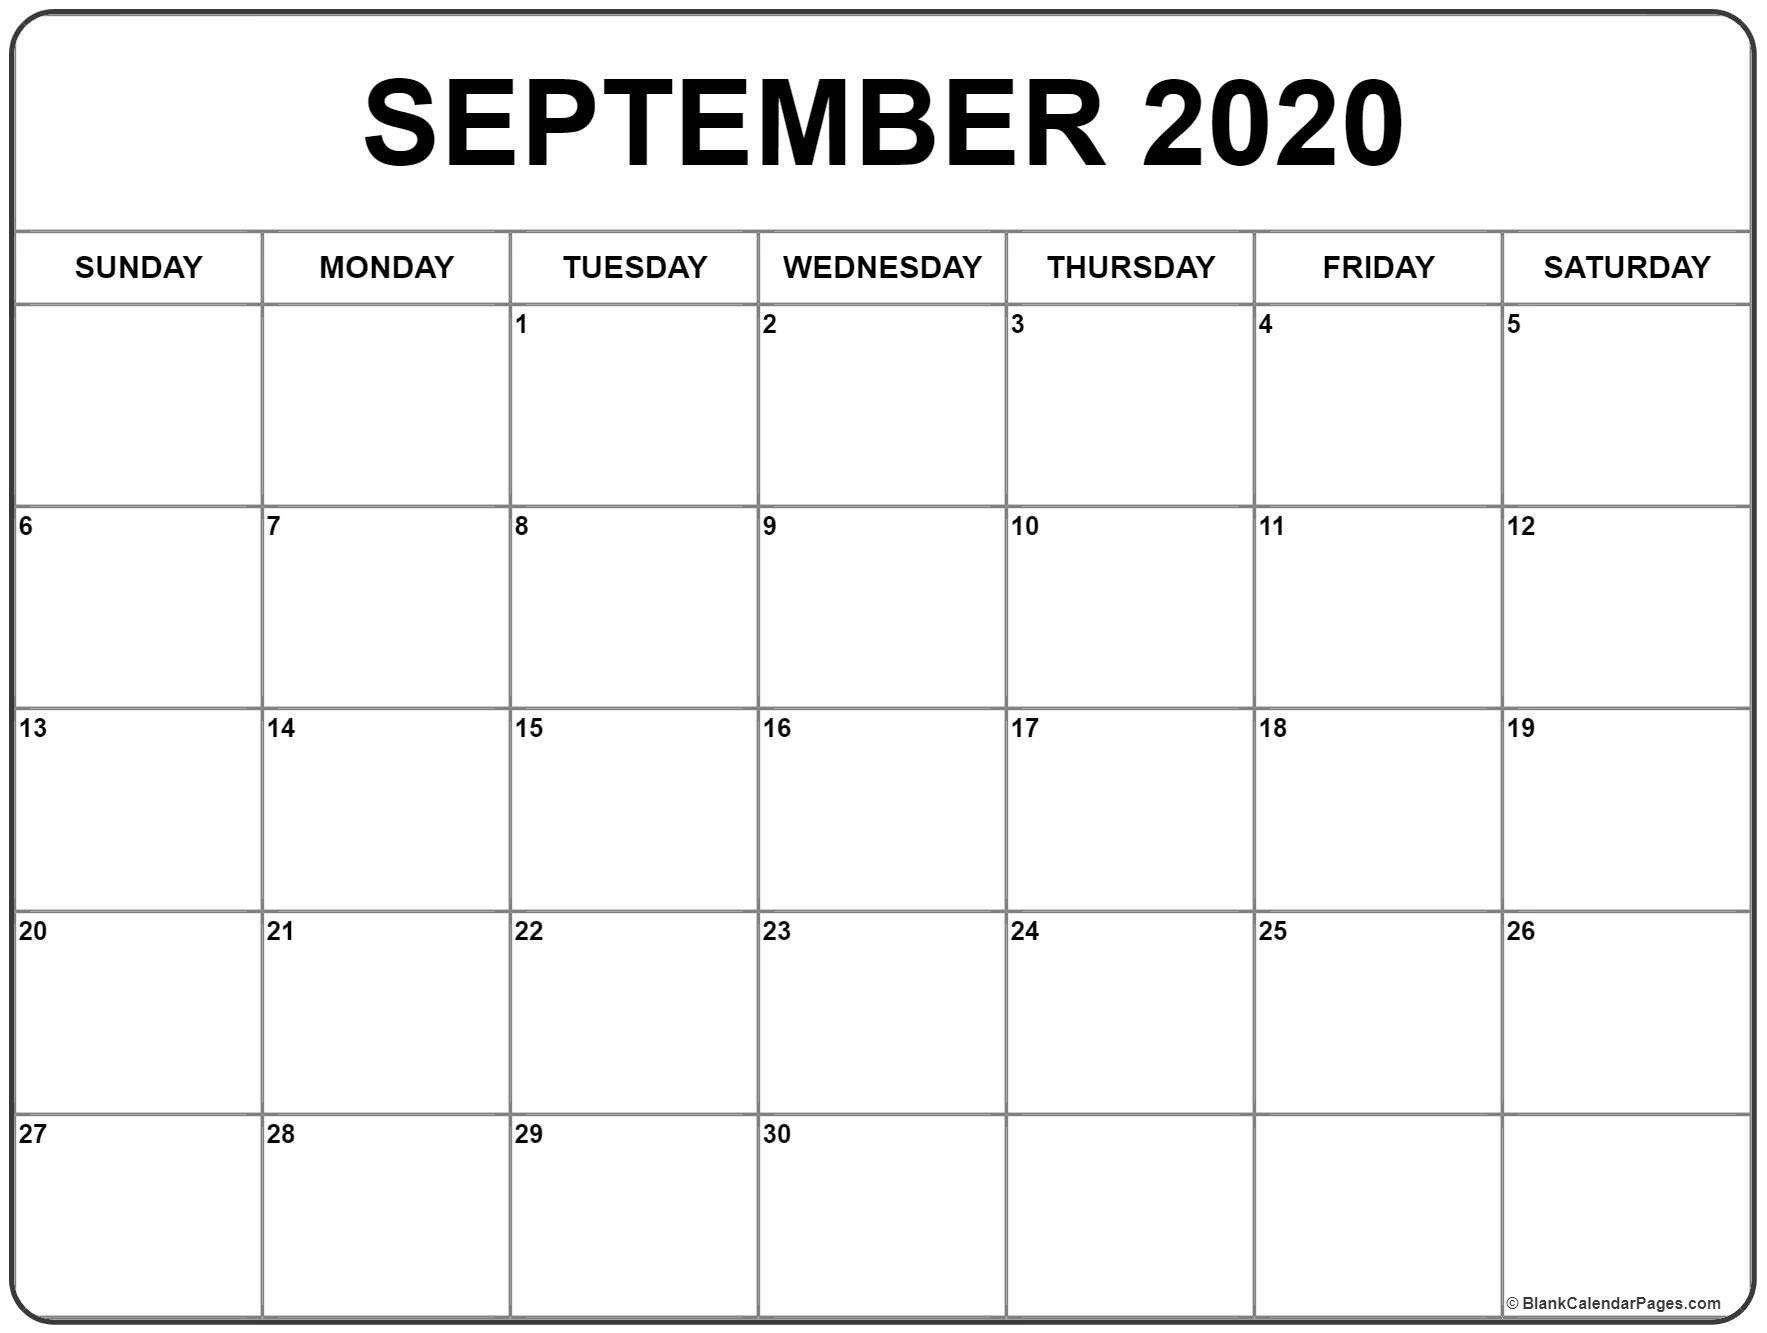 June 2020 Calendar With Holidays - Wpa.wpart.co-2020 Calendar With Jewish Holidays Printable